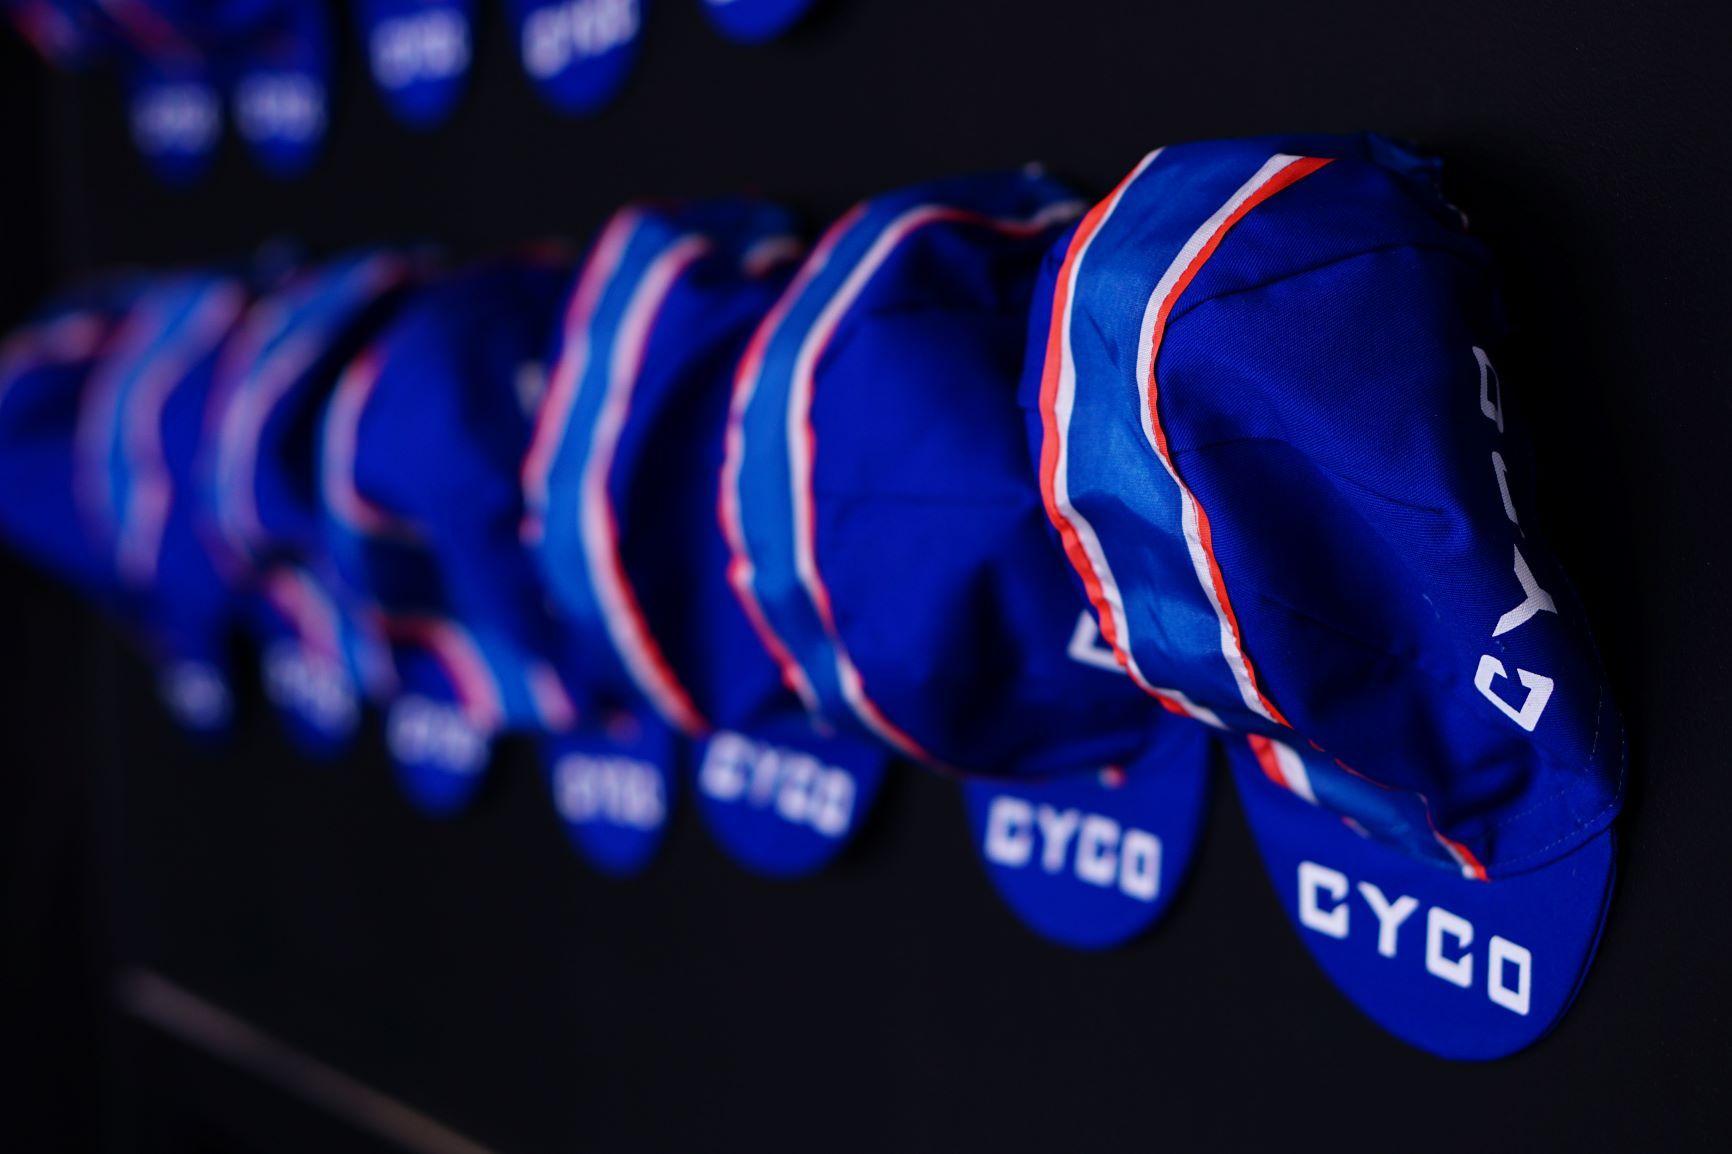 CYCO caps